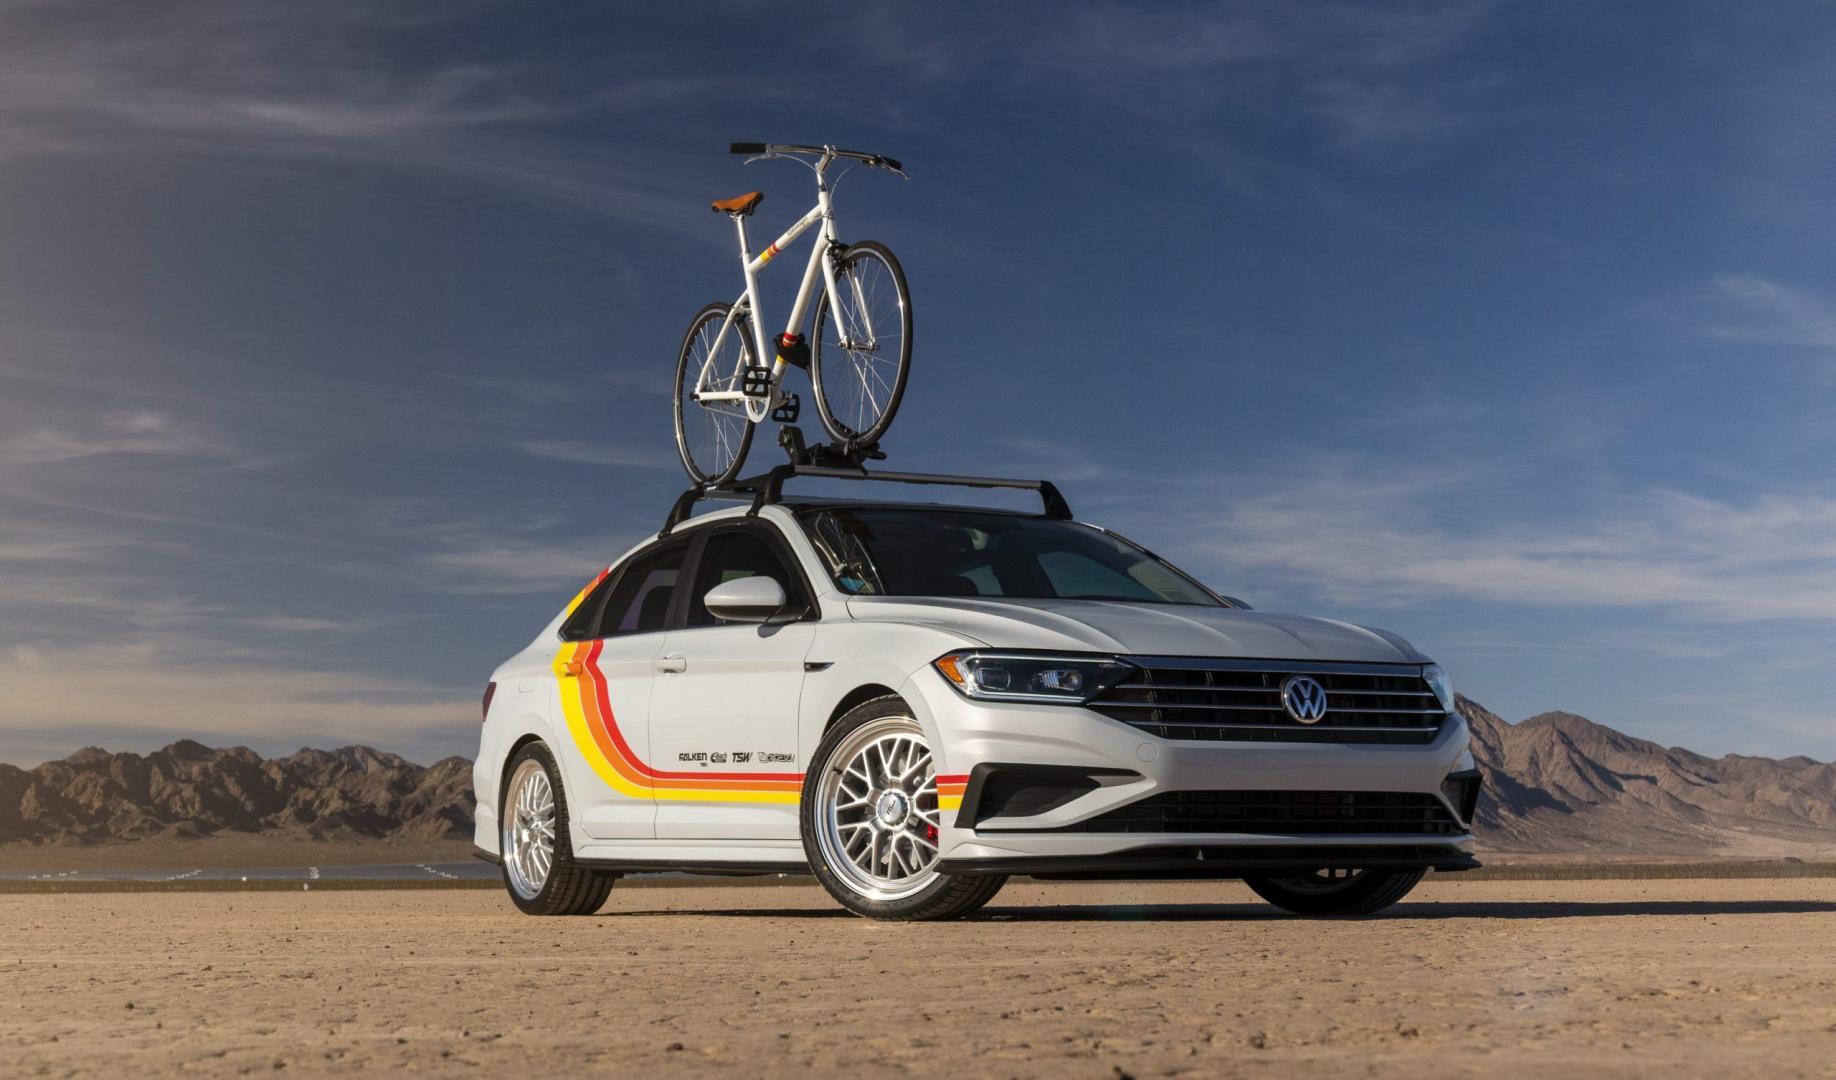 Volkswagen Jetta air design fiets